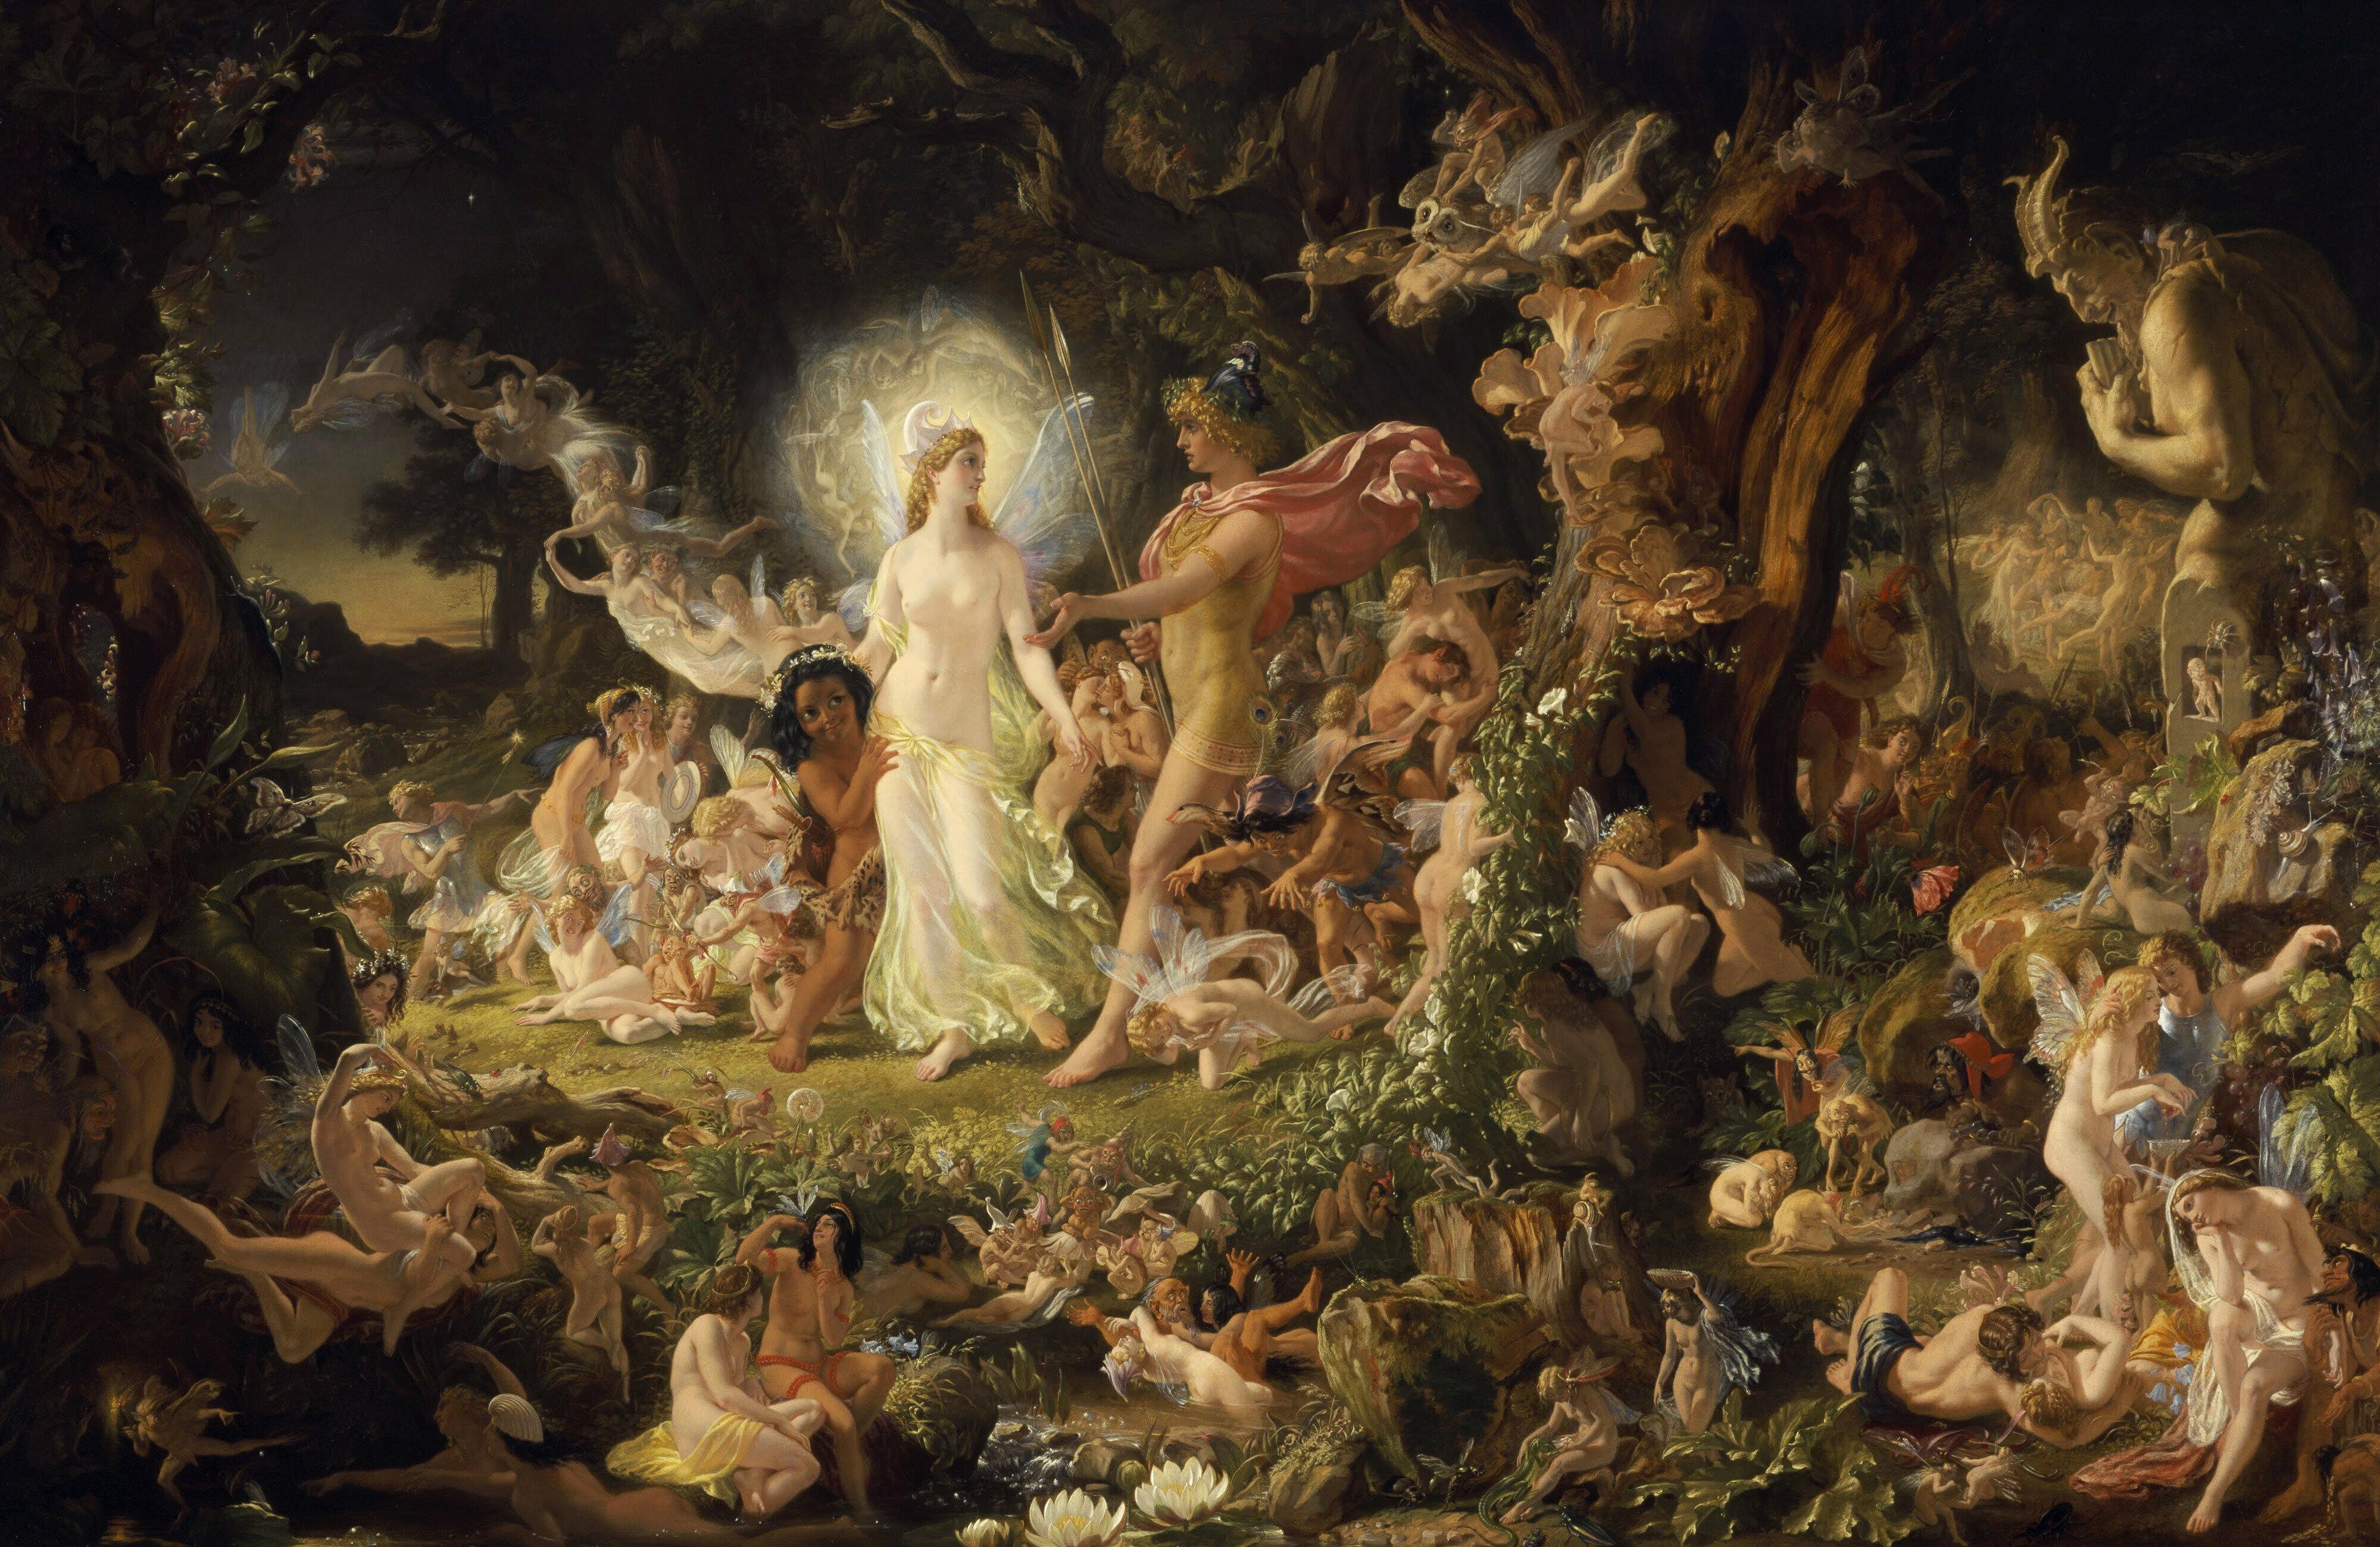 The Quarrel of Oberon and Titania by Joseph Noel Paton 1846